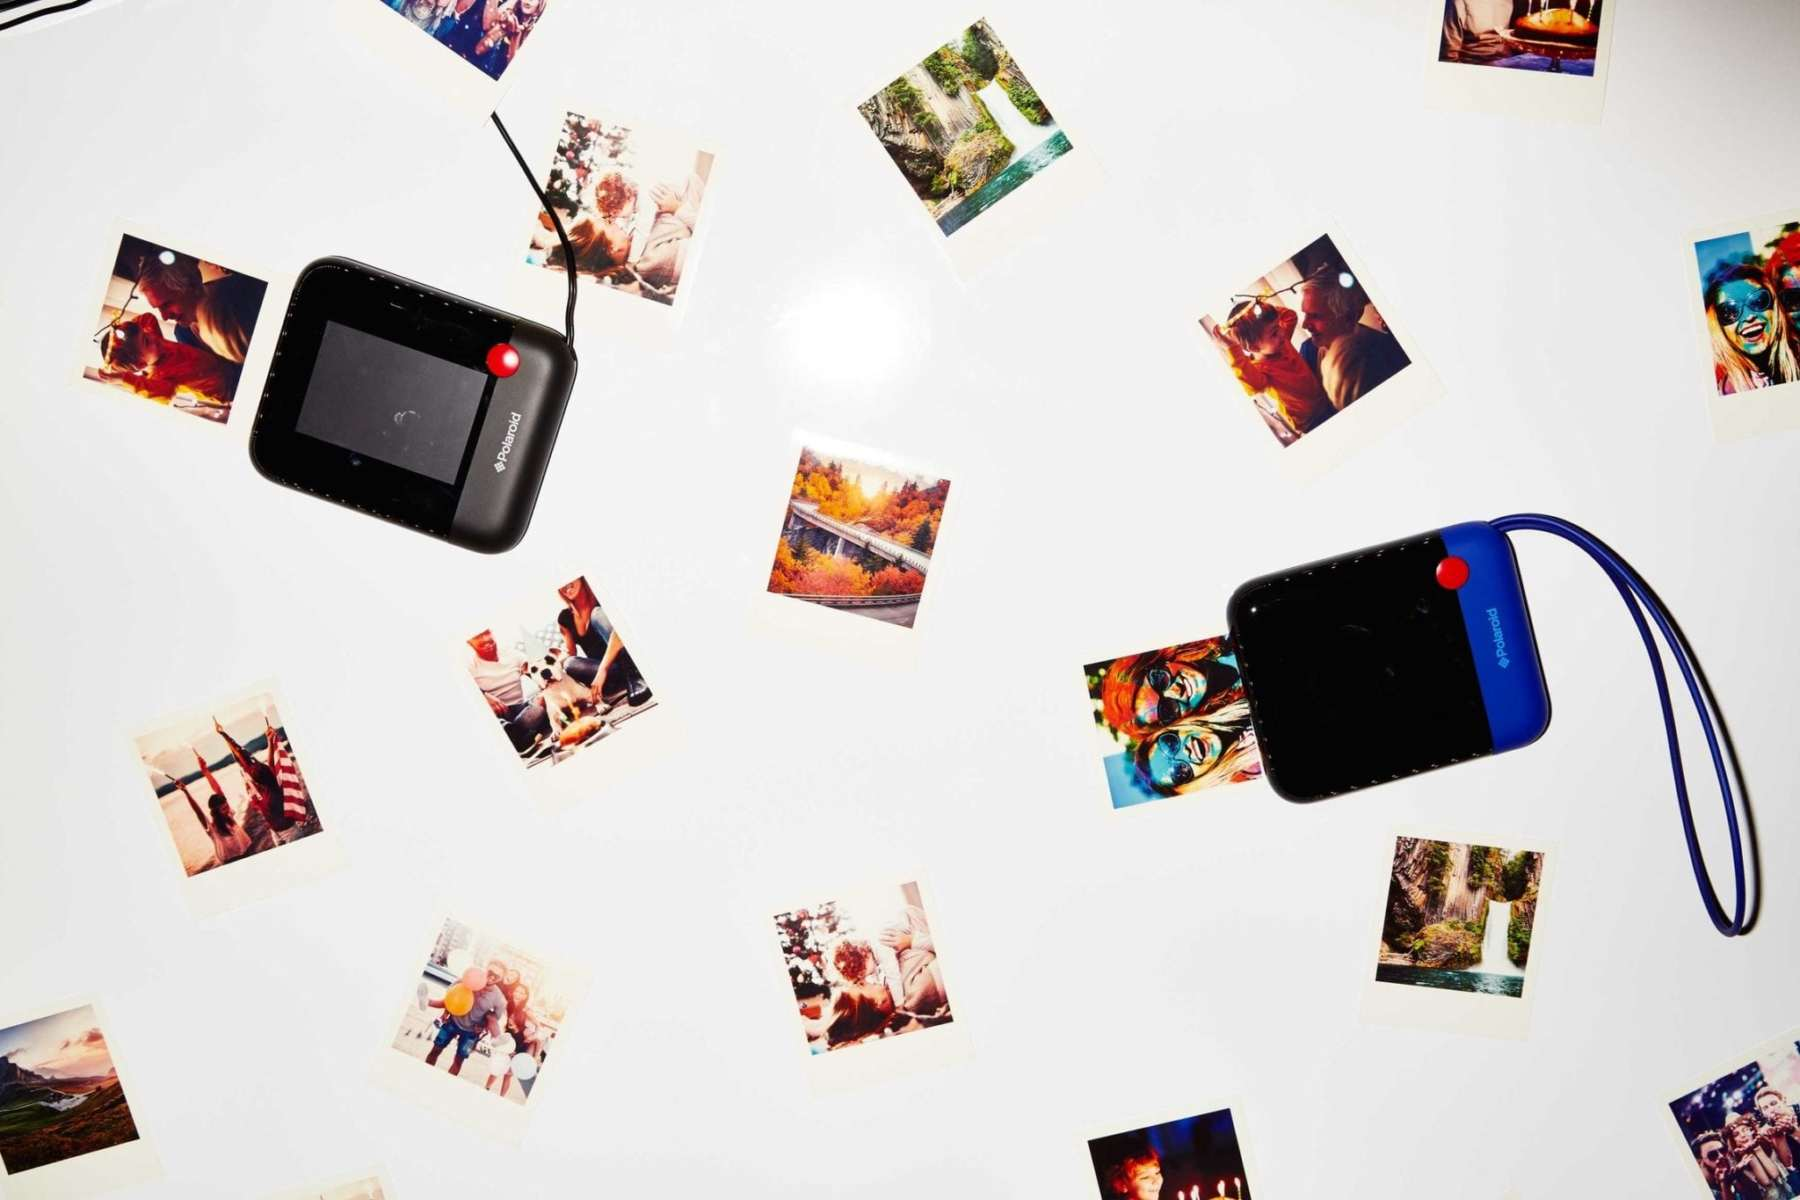 polstoif pop polaroid instant digital camera photography